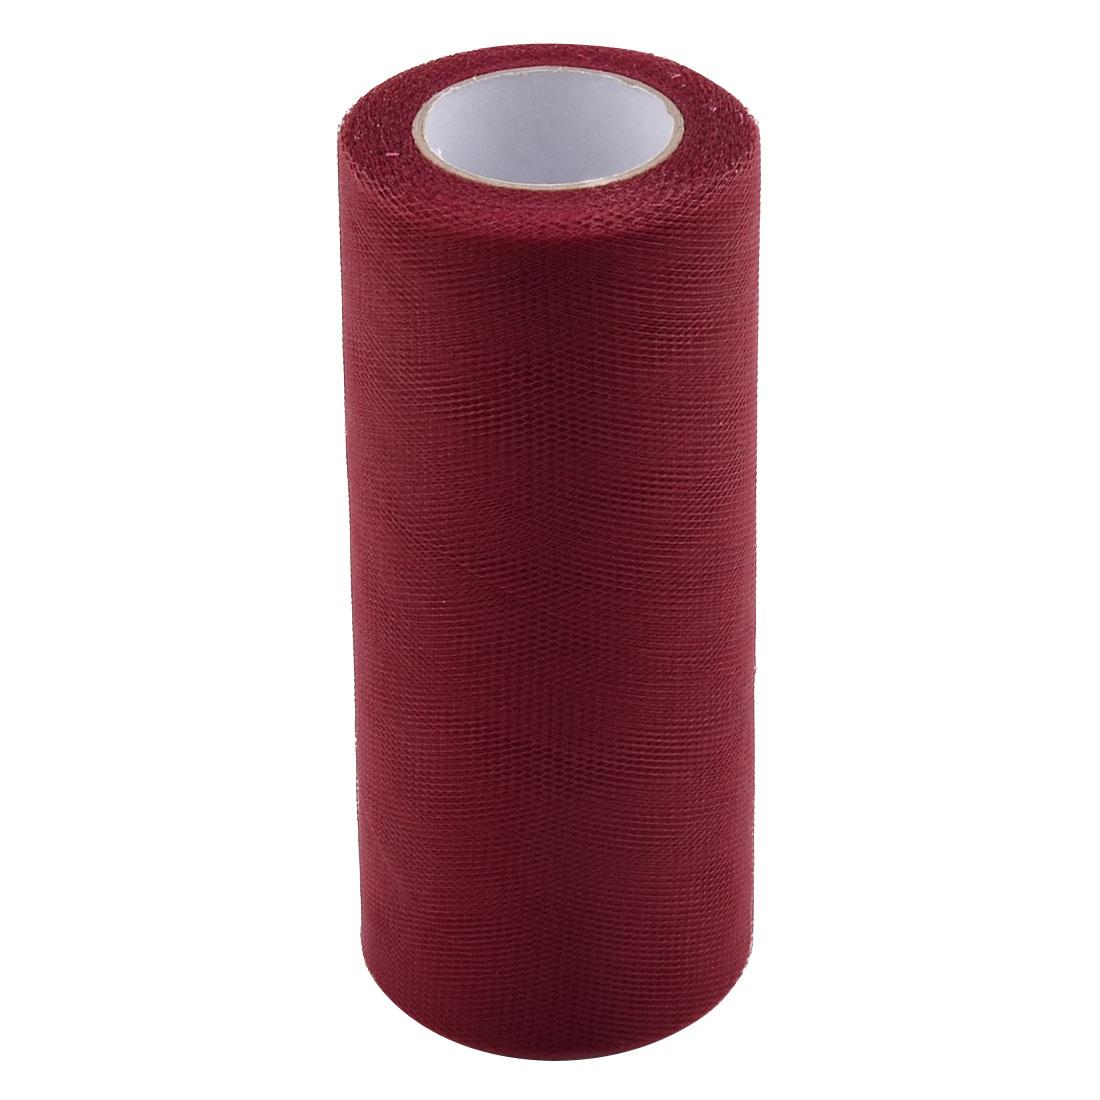 Wedding Polyester Gift Box DIY Decor Tulle Spool Roll Burgundy 6 Inch x 25 Yards